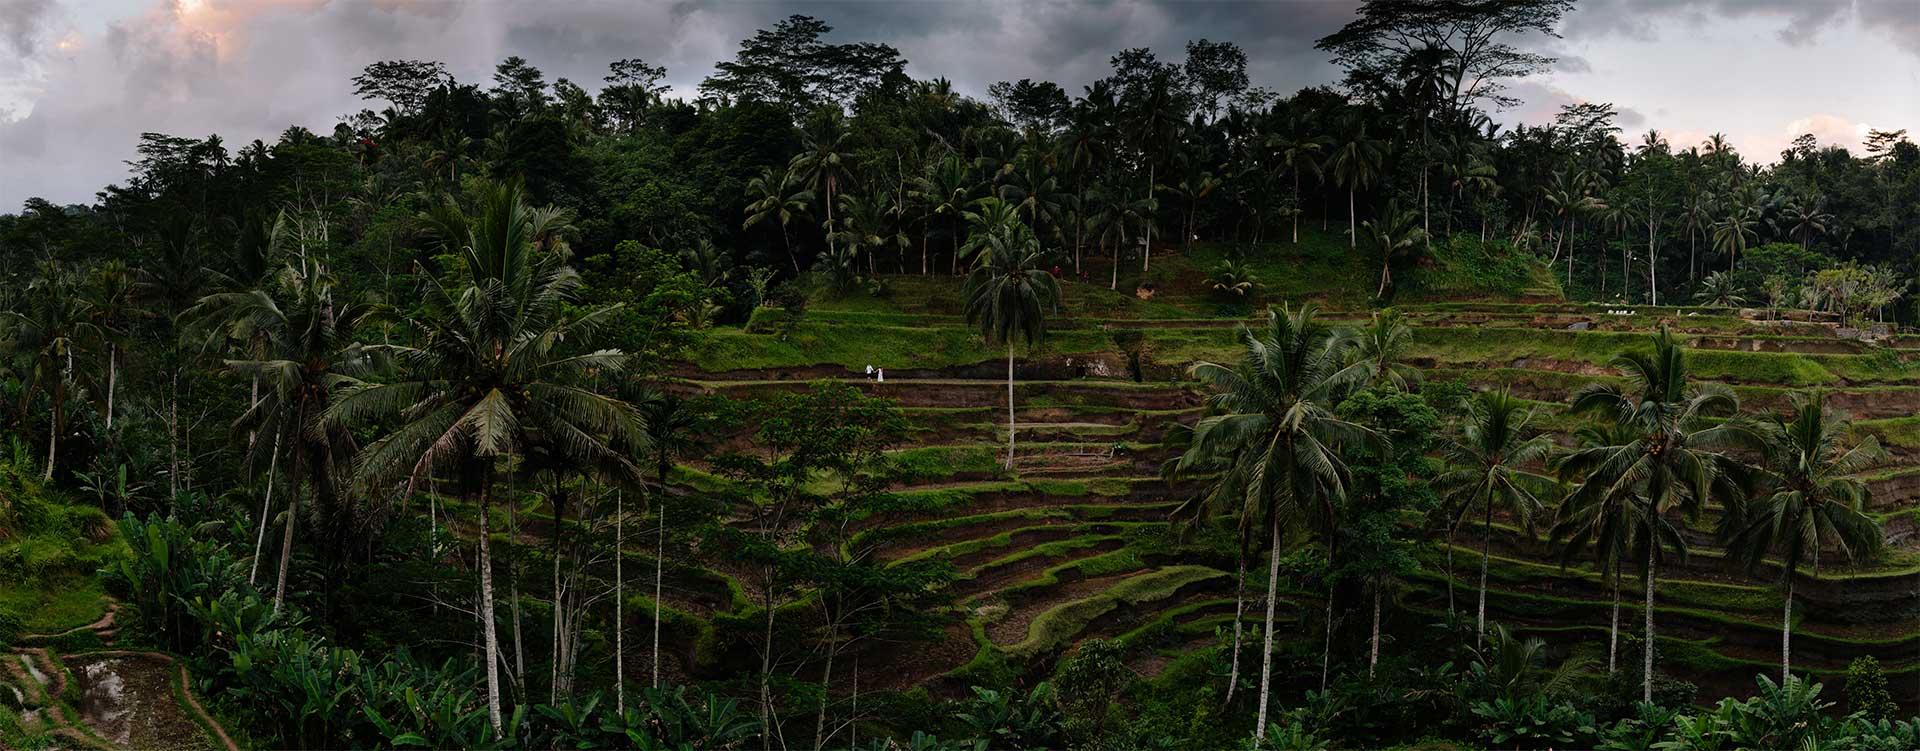 marc-megan-rice-field-panorama-bali2_Small